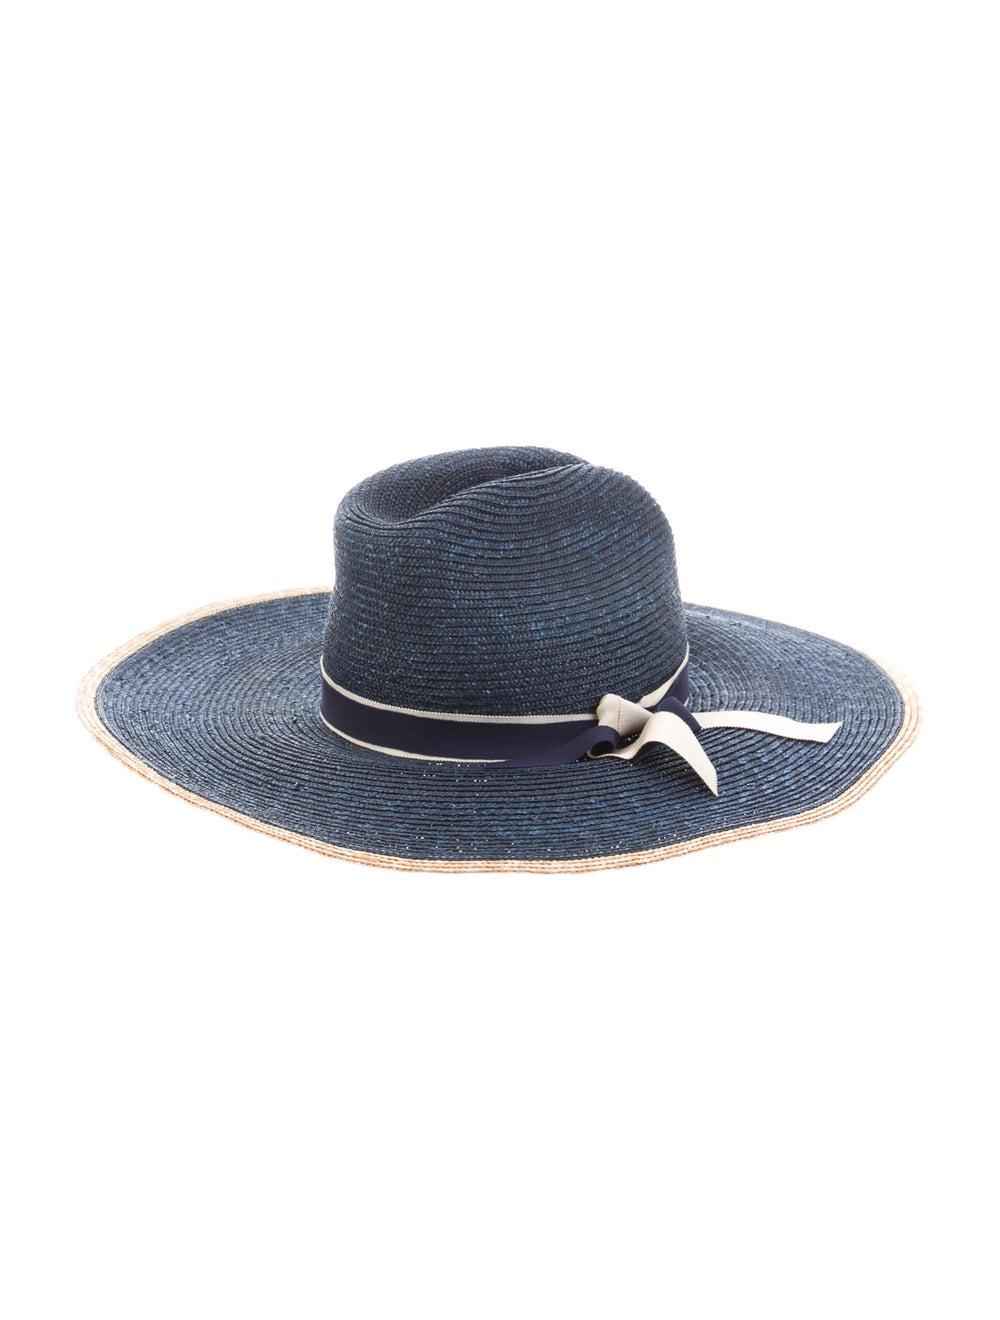 Veronica Beard Straw Wide Brim Hat Blue - image 2